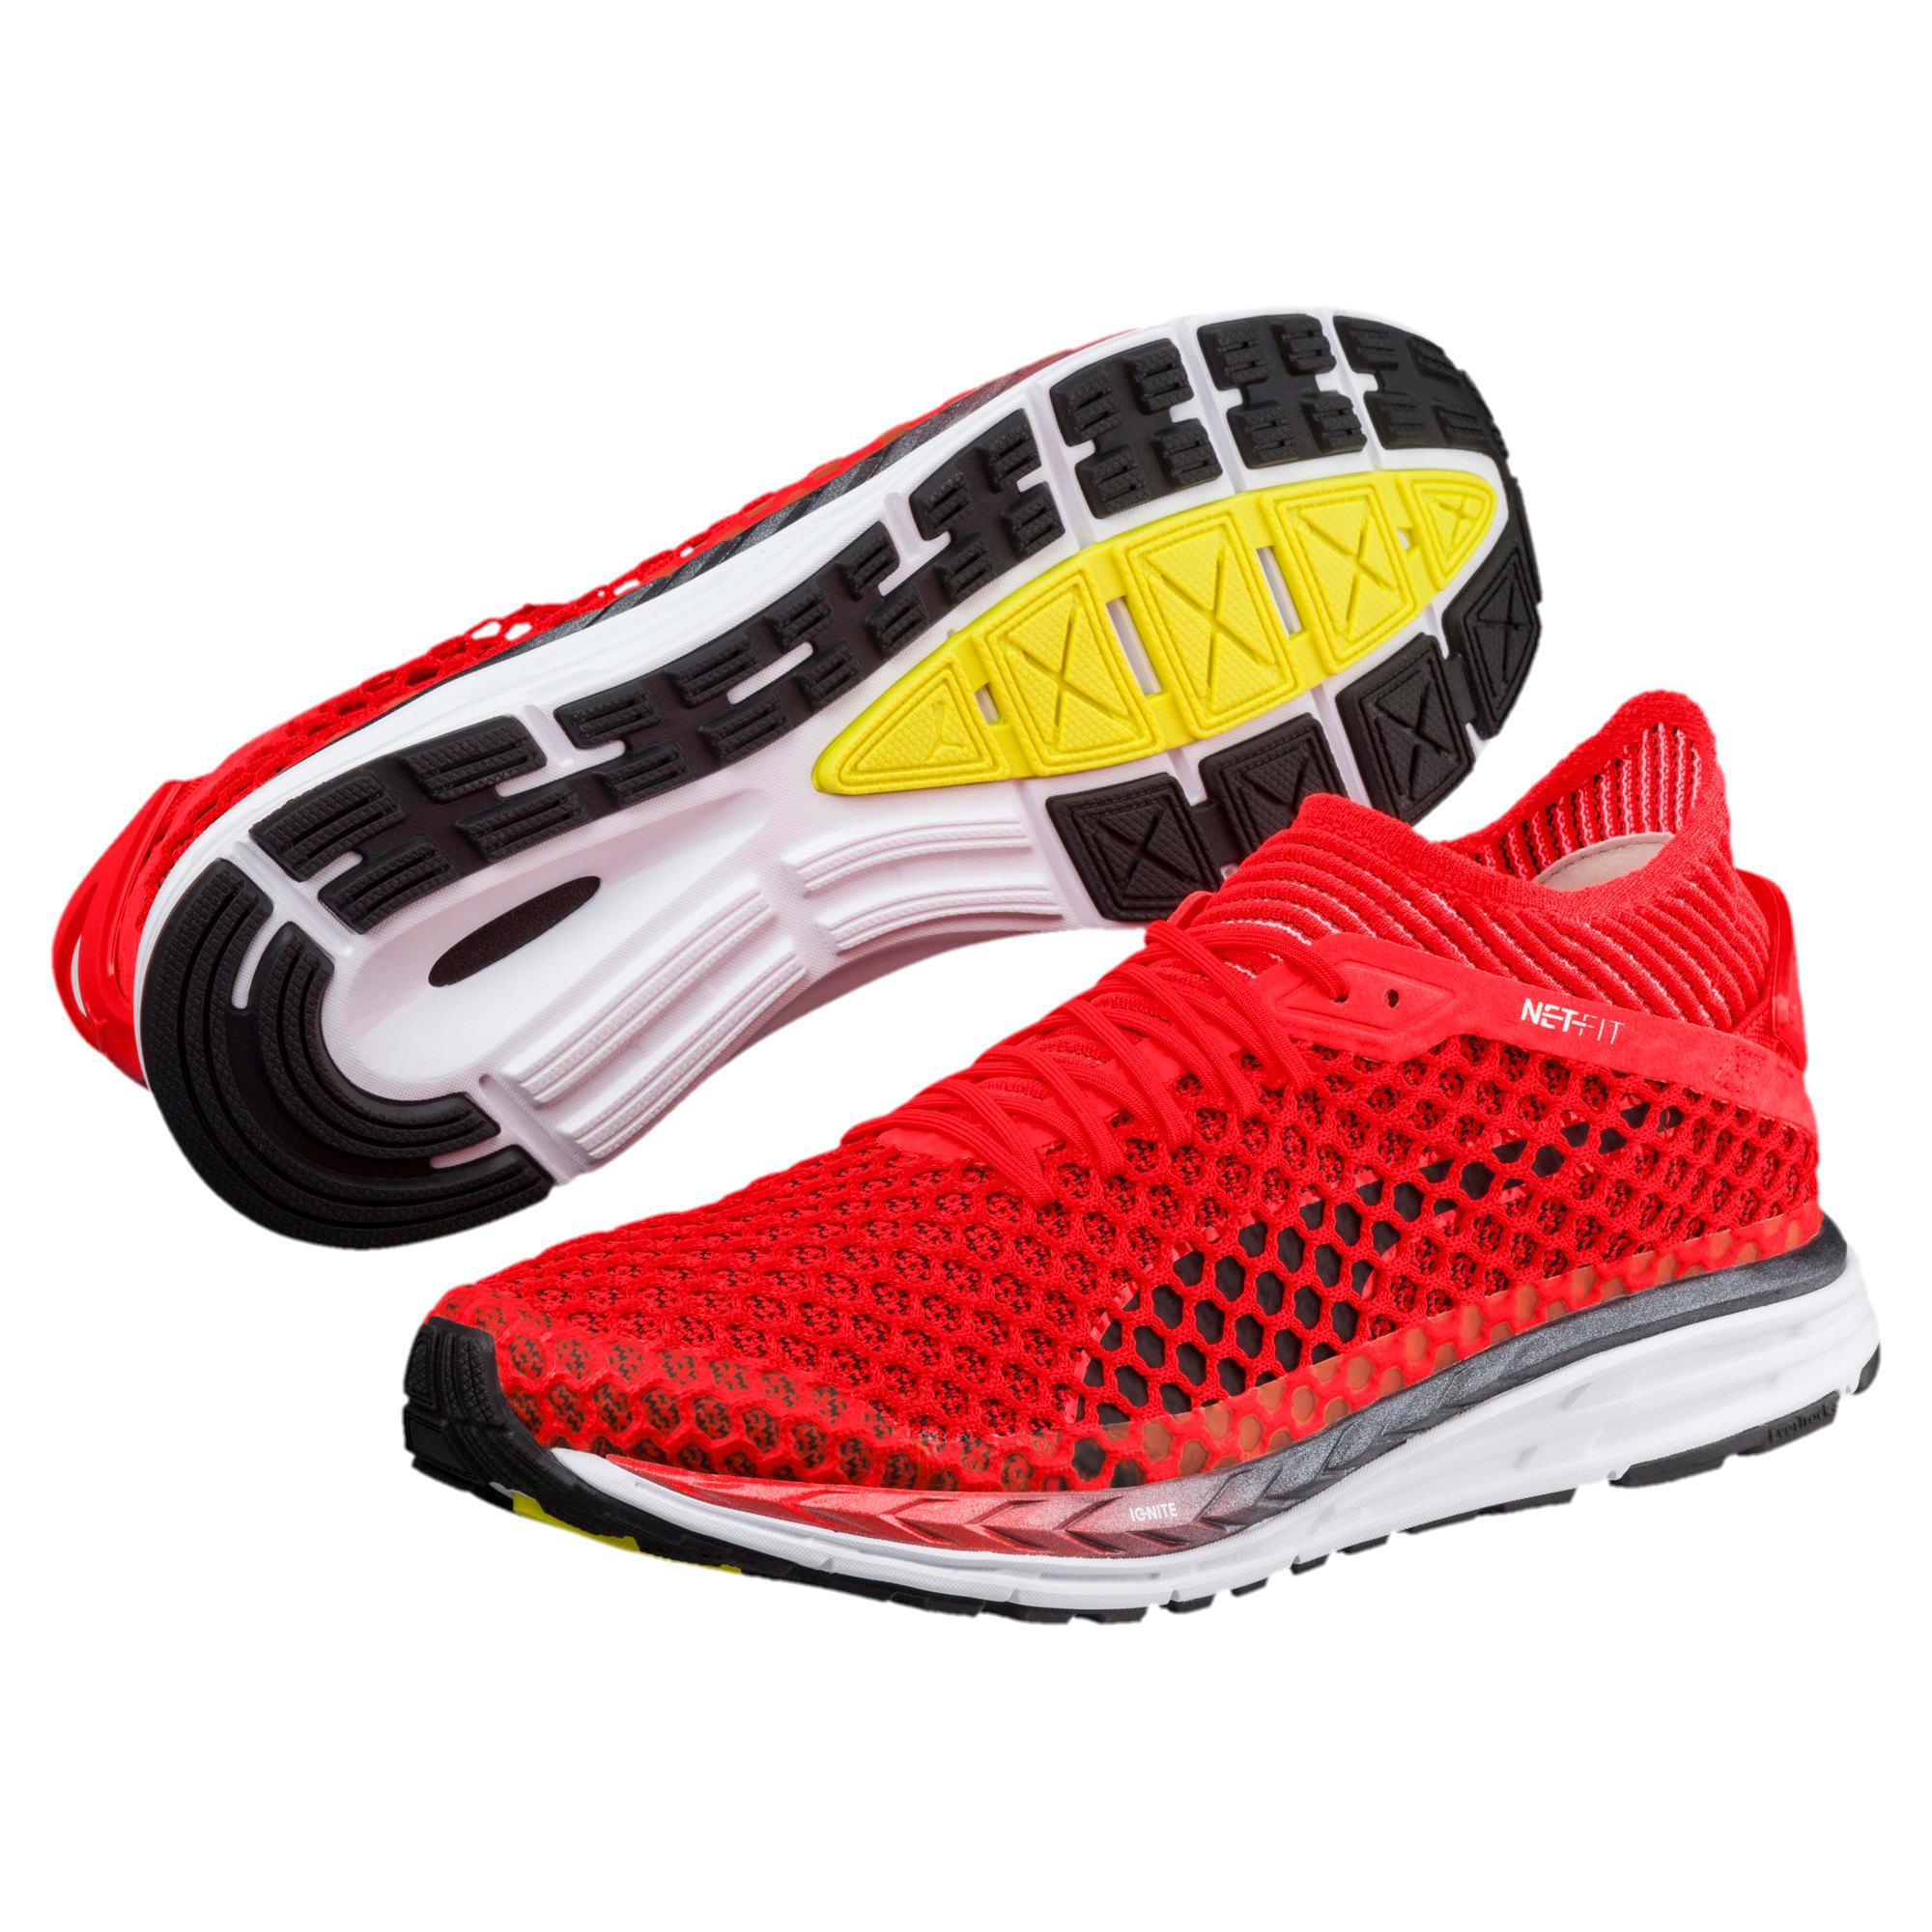 Thumbnail 2 of Speed IGNITE NETFIT 2 Men's Running Shoes, Red Blast-White-Black, medium-IND